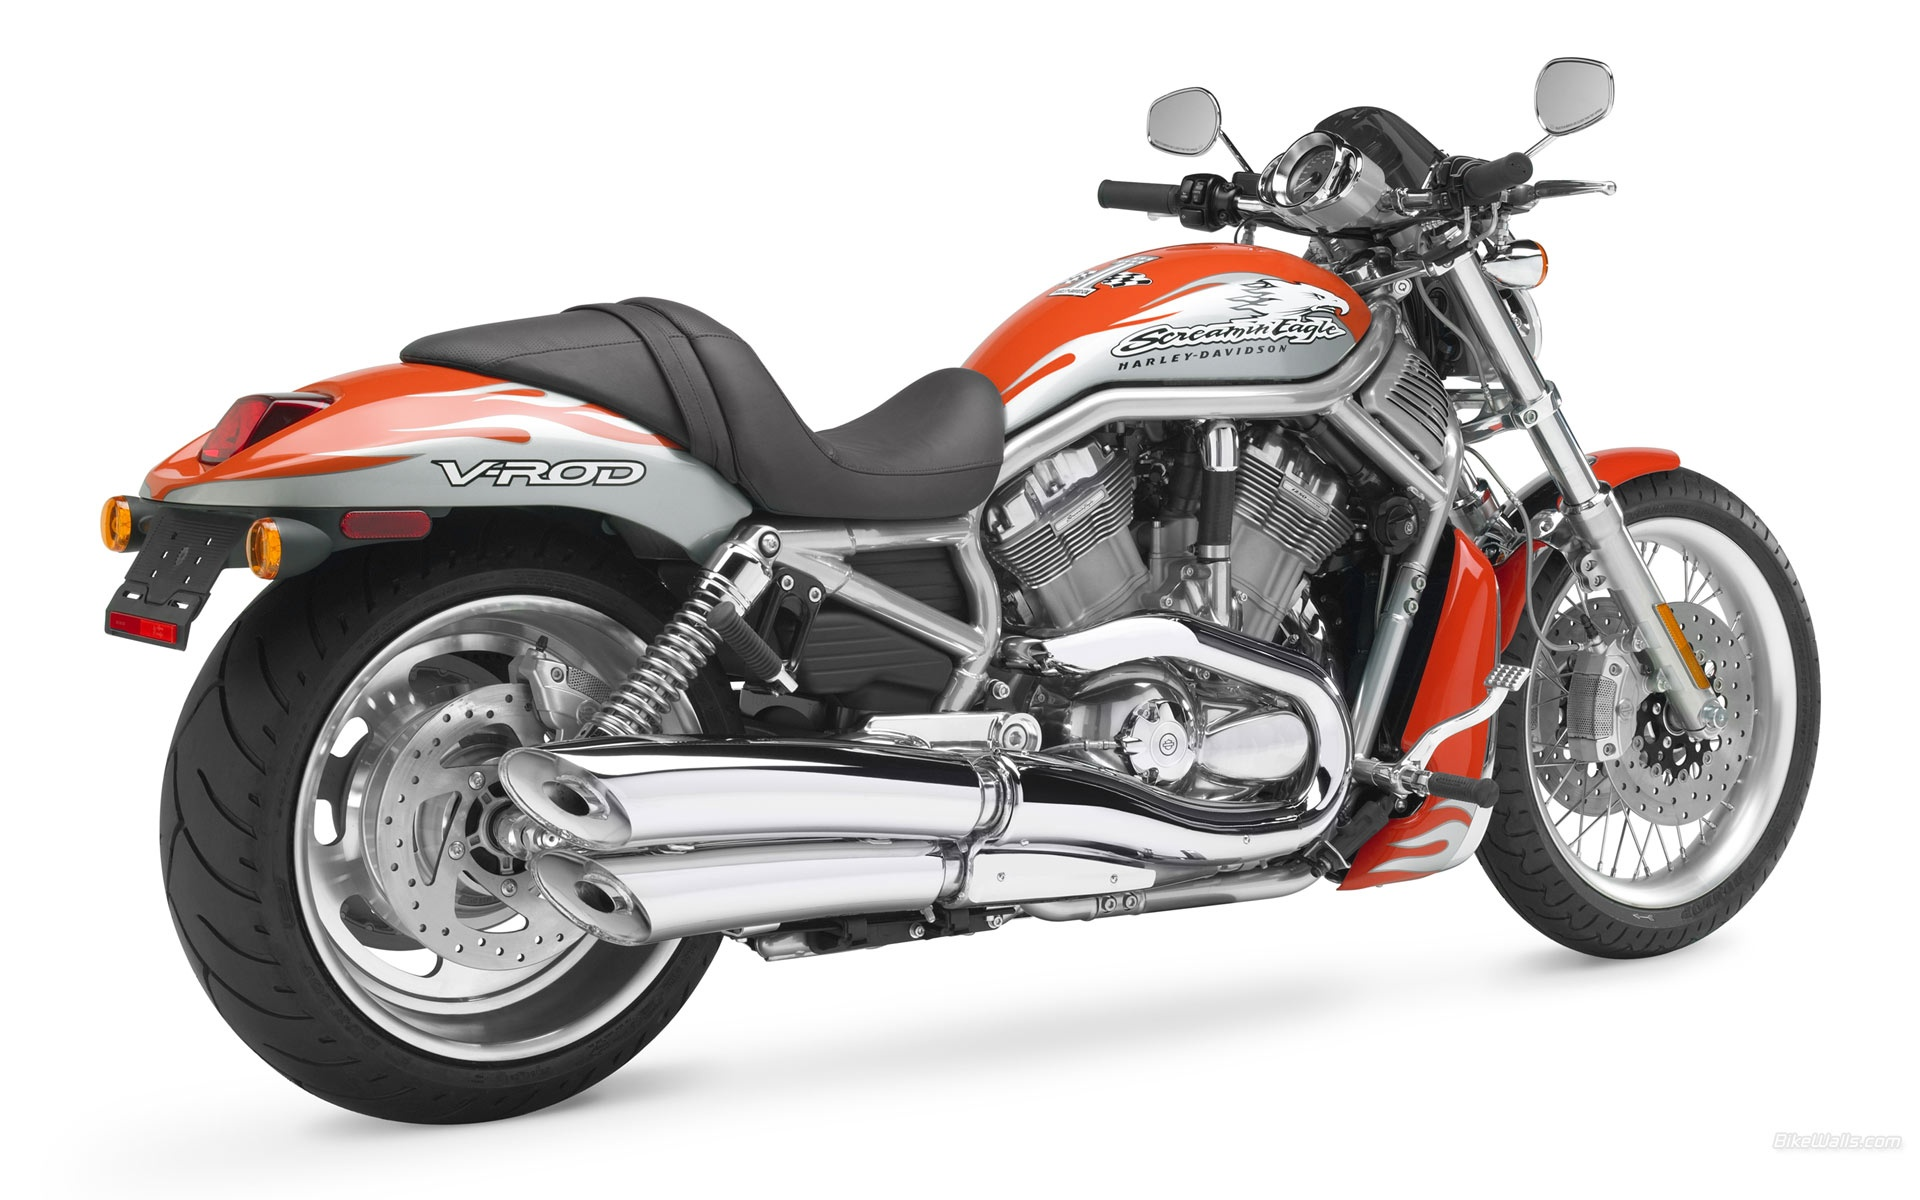 Fondos De Pantalla Harley Davidson V Rod Motocicleta